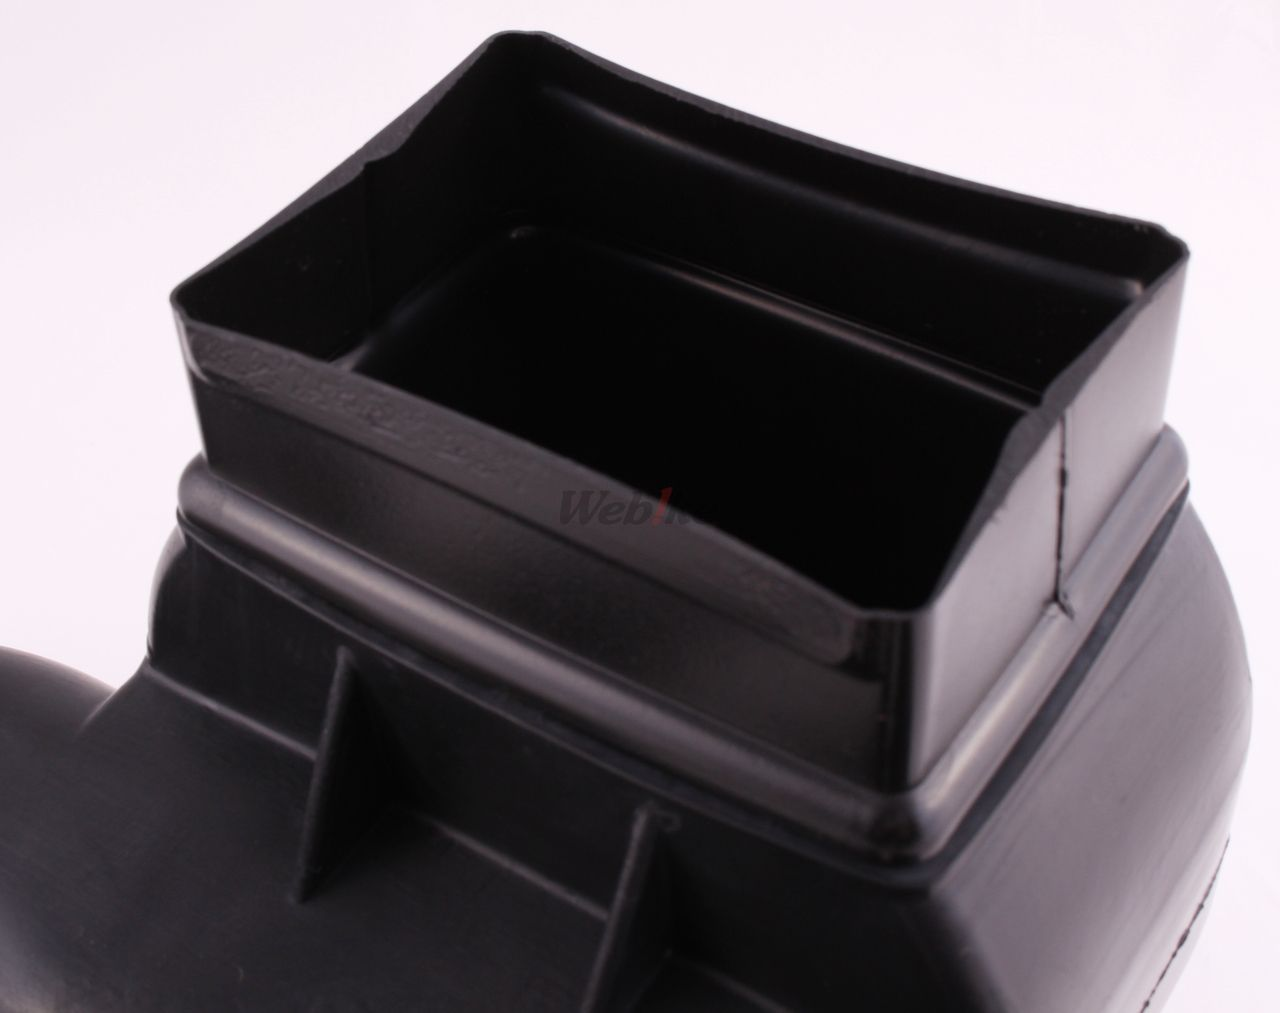 【PMC】Z1/Z2 空氣濾清器箱 - 「Webike-摩托百貨」